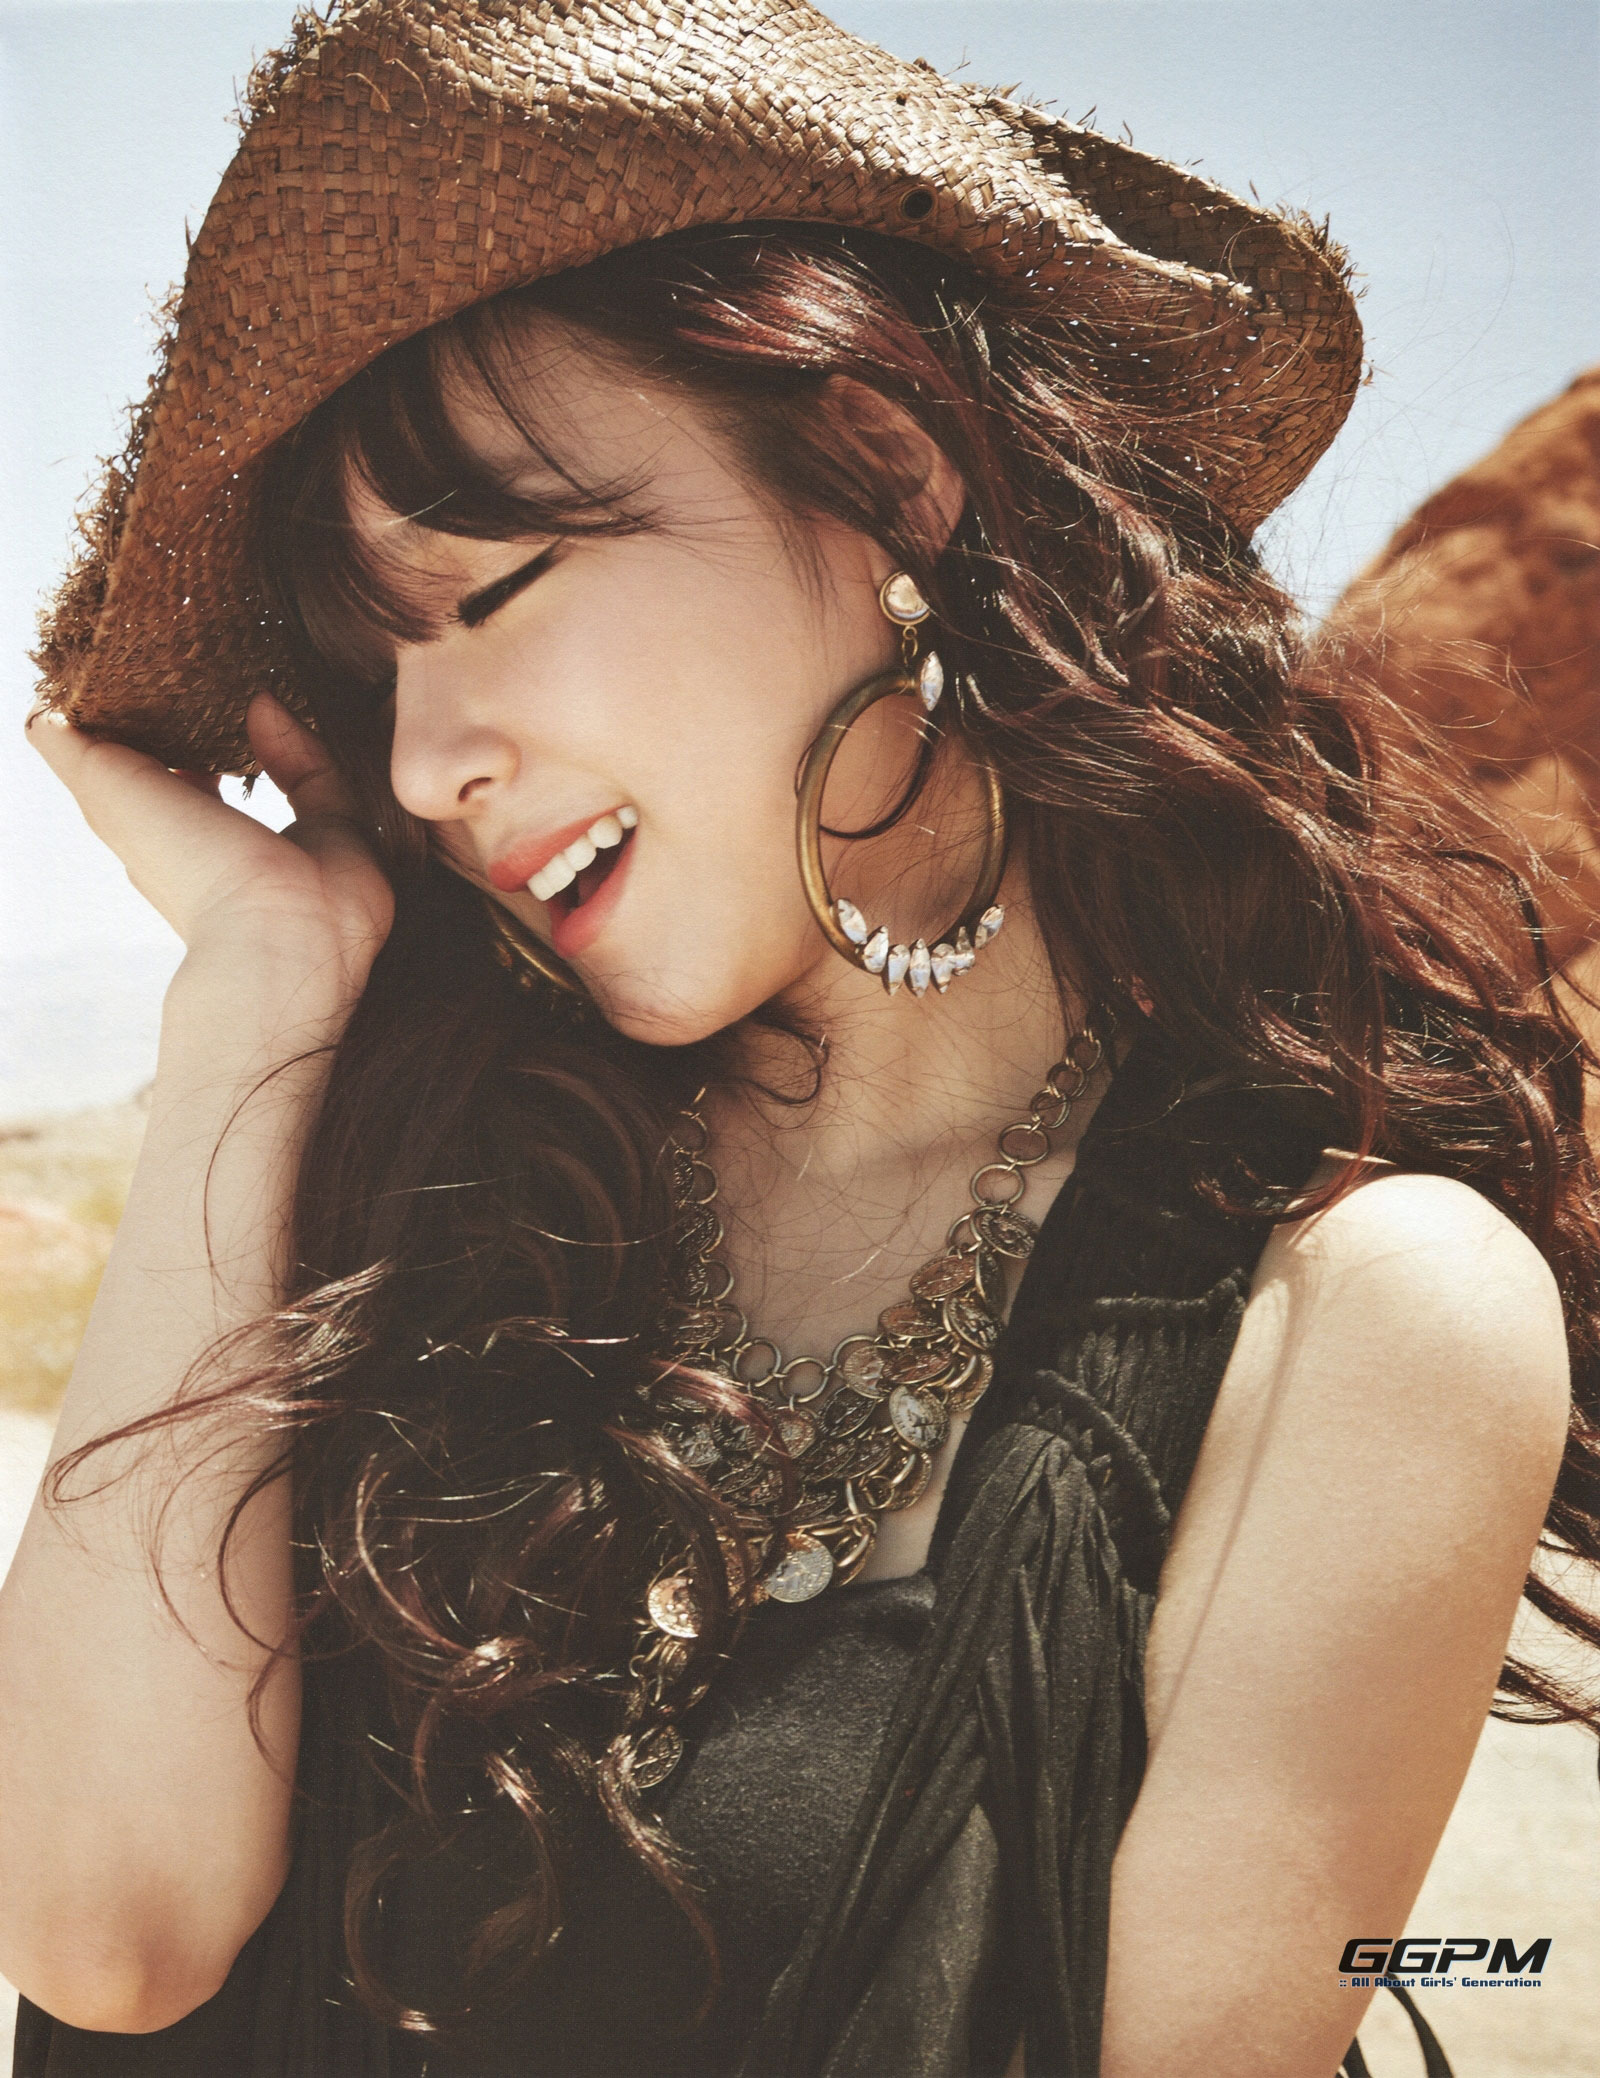 Girls Generation Tiffany 7th anniversary photobook